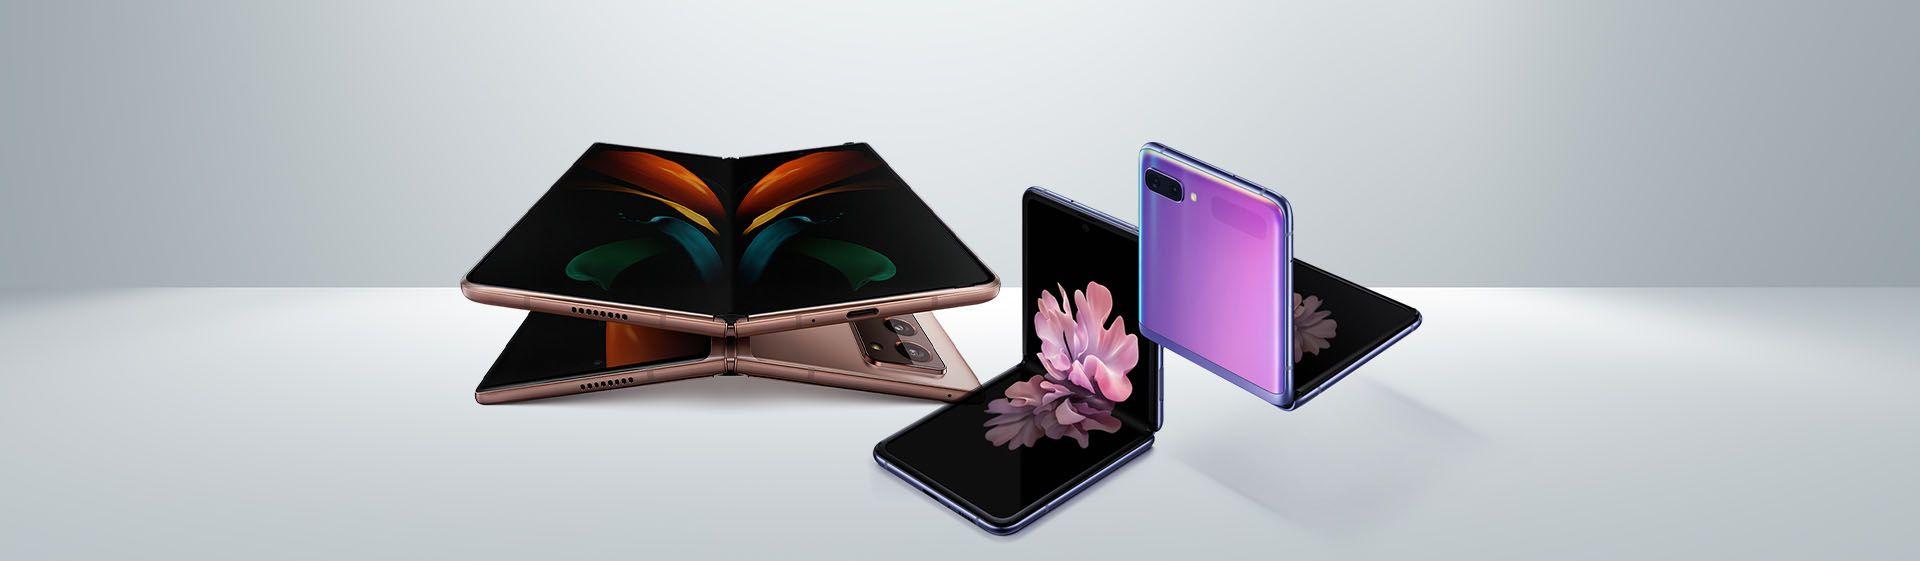 Samsung dobrável: comparativo entre Galaxy Z Flip e Galaxy Fold 2